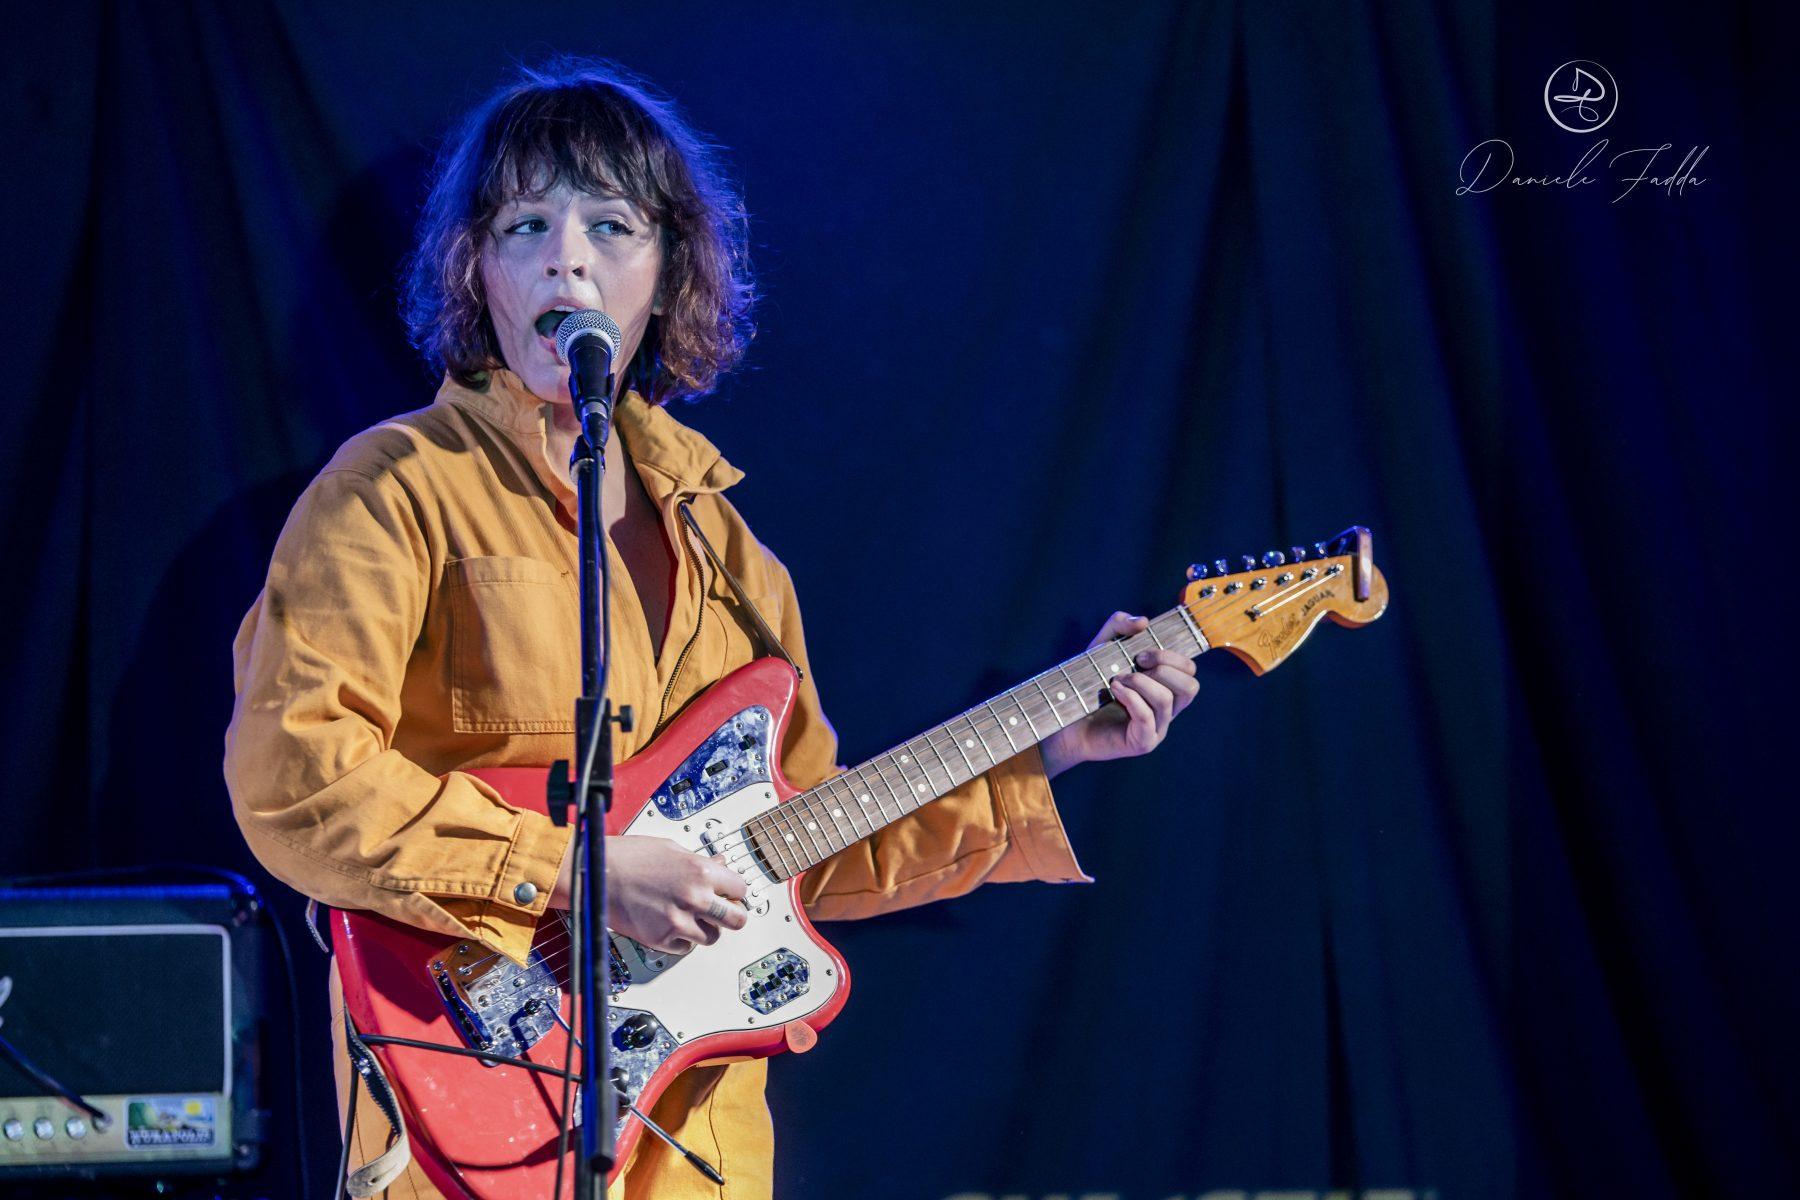 kme - live report - emme woods - daniele fadda - sa scena sarda - 2019 - karel music expo